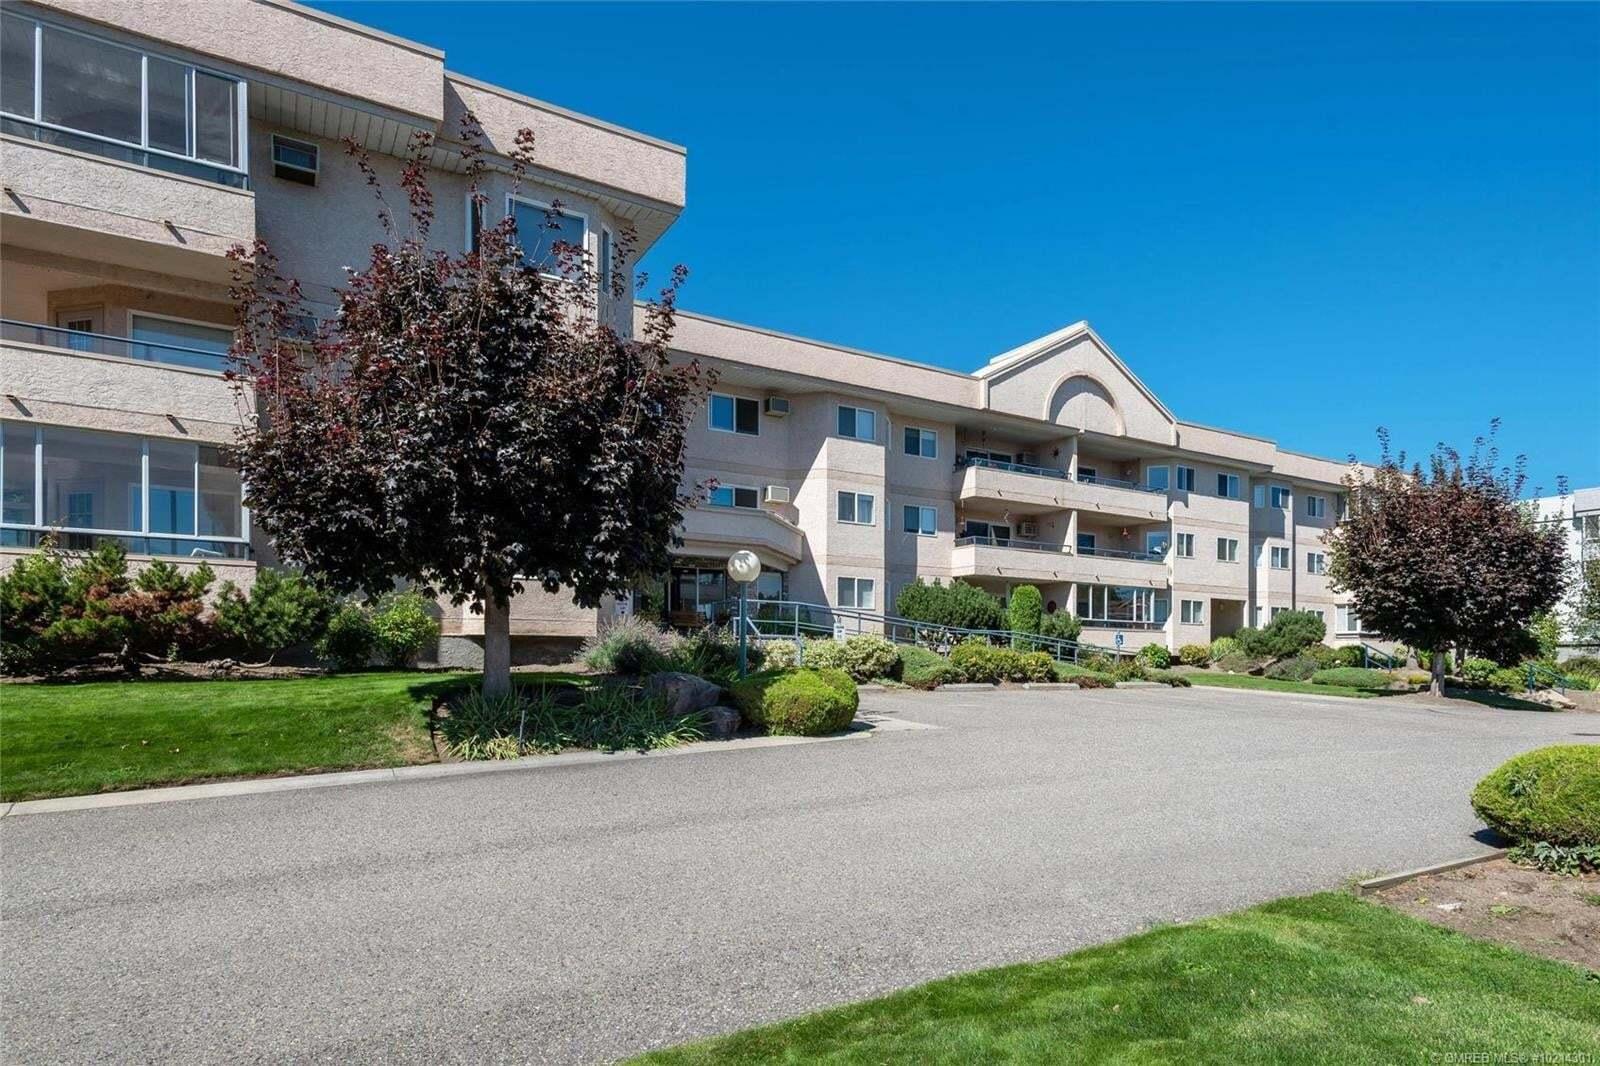 Condo for sale at 3858 Brown Rd Unit 306 West Kelowna British Columbia - MLS: 10214301